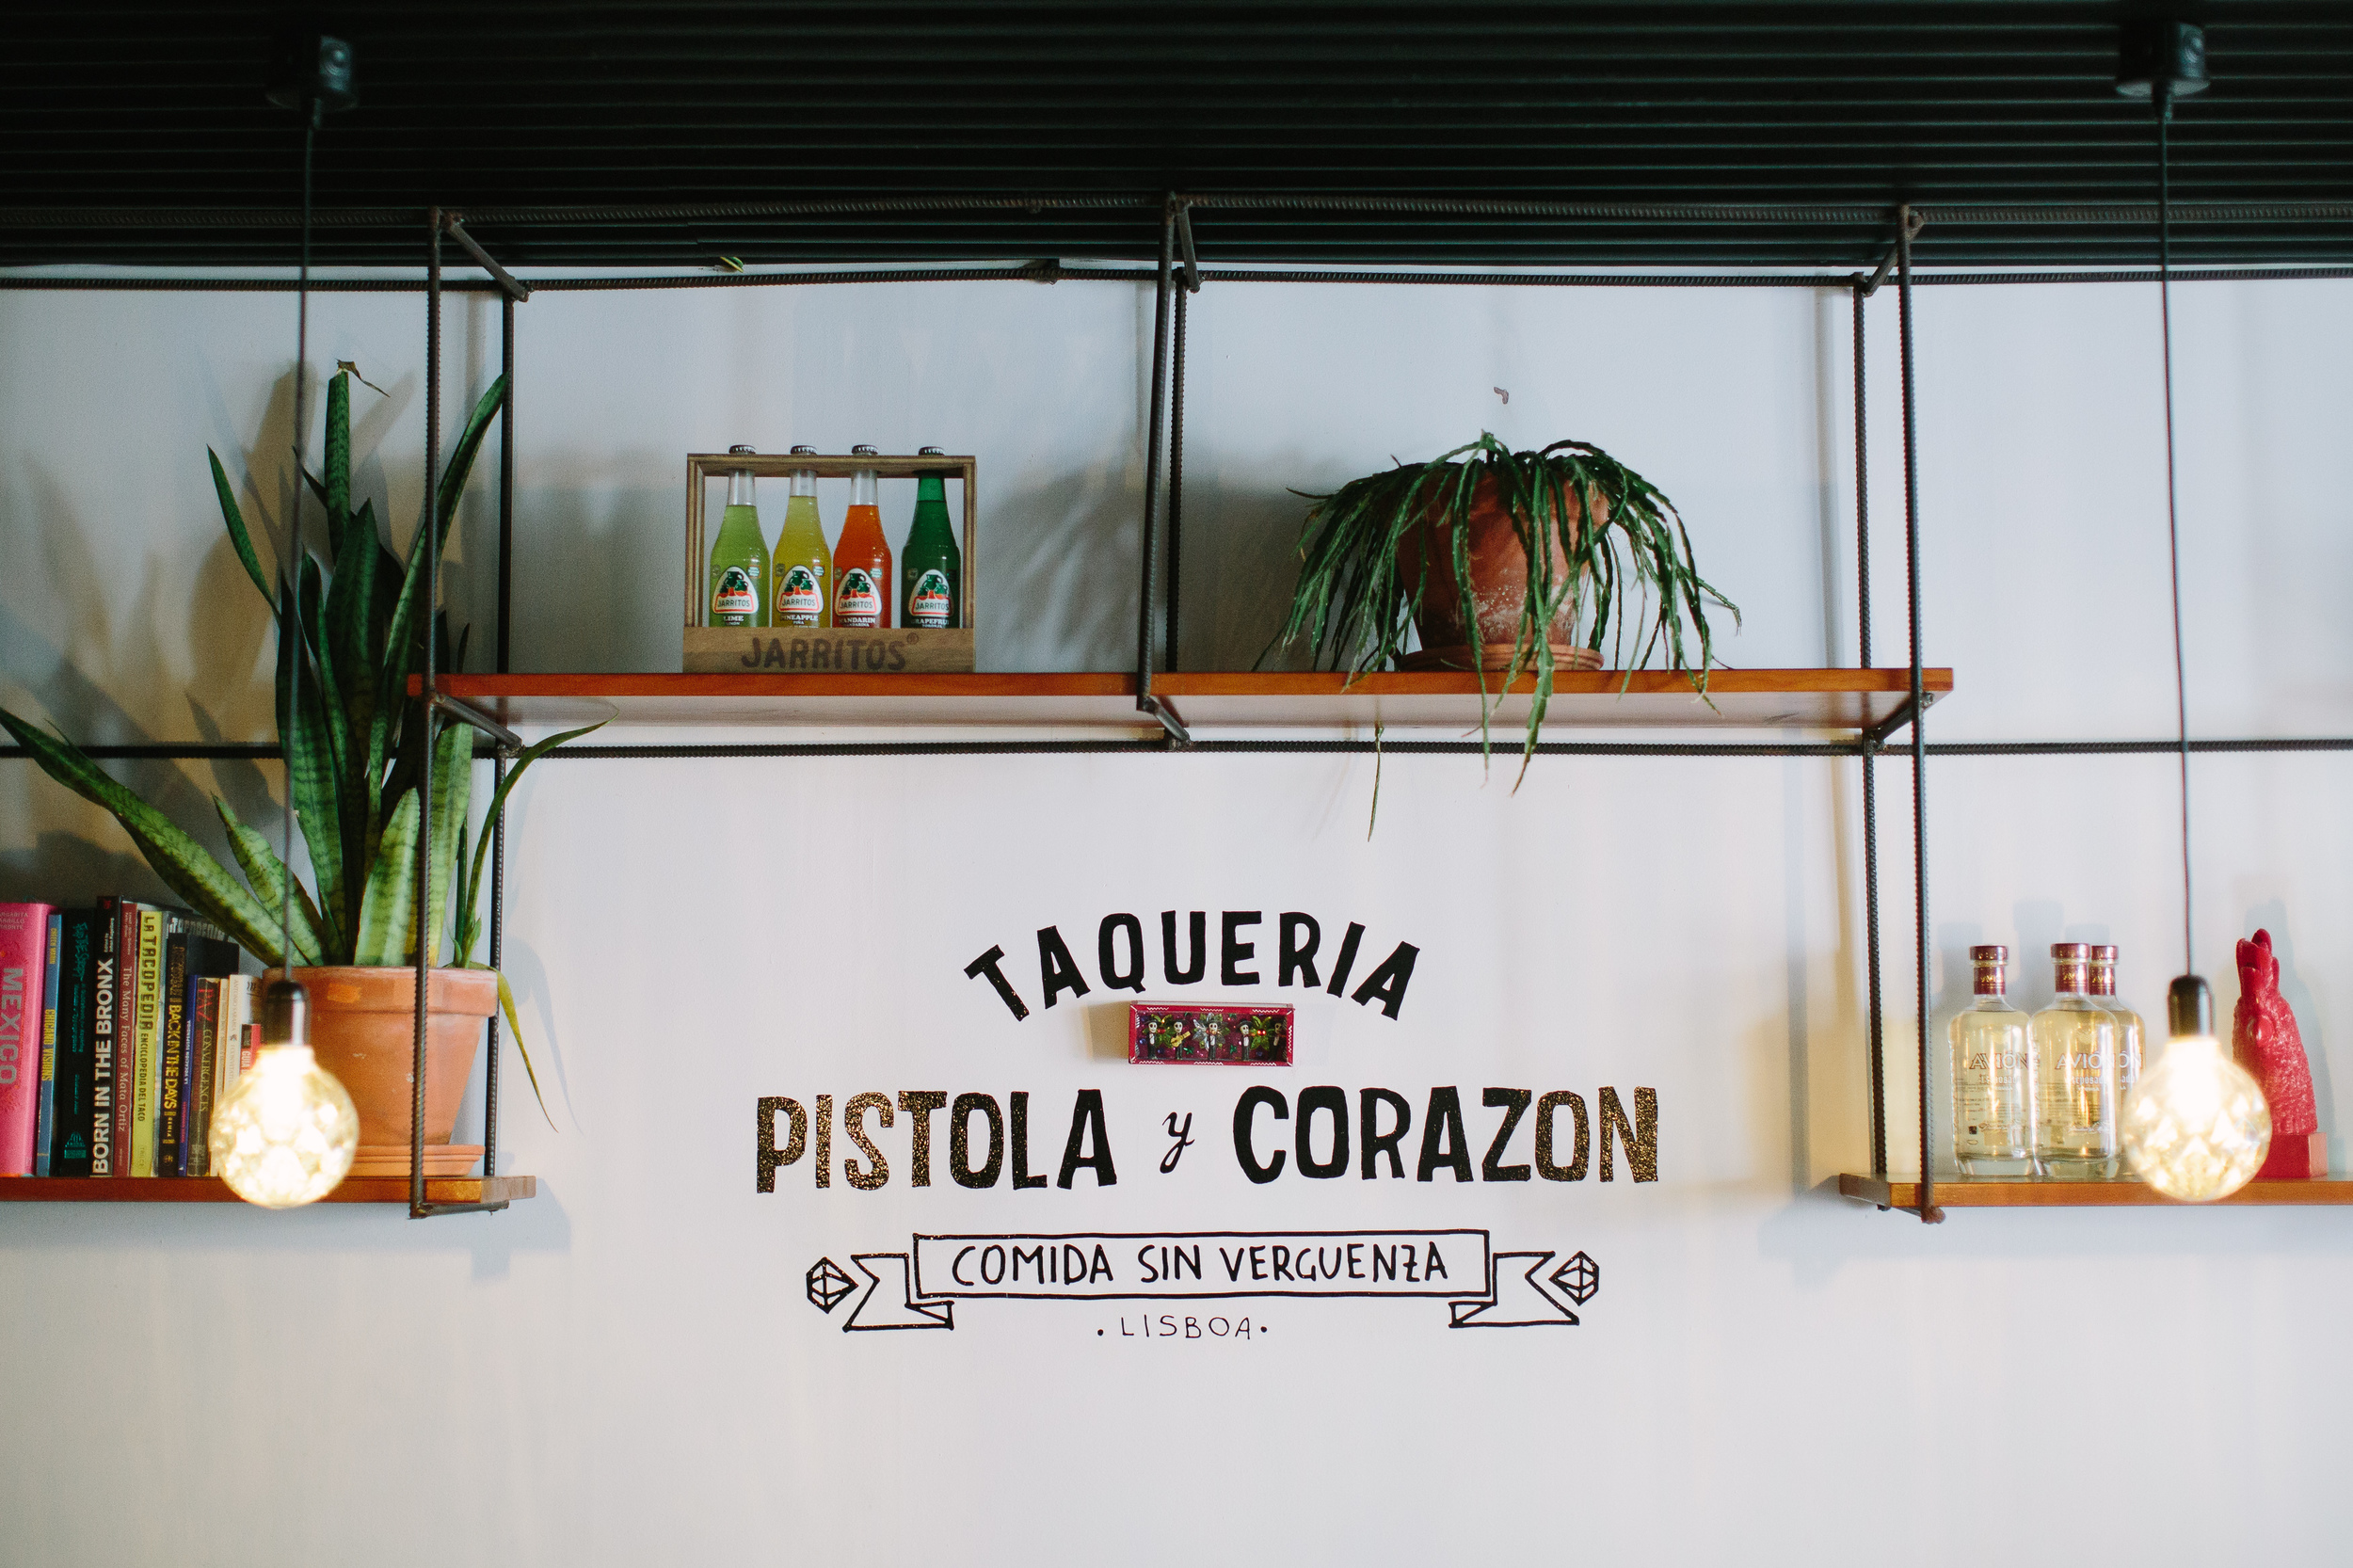 Nicodem Creative_Pistola y Corazon-4.jpg